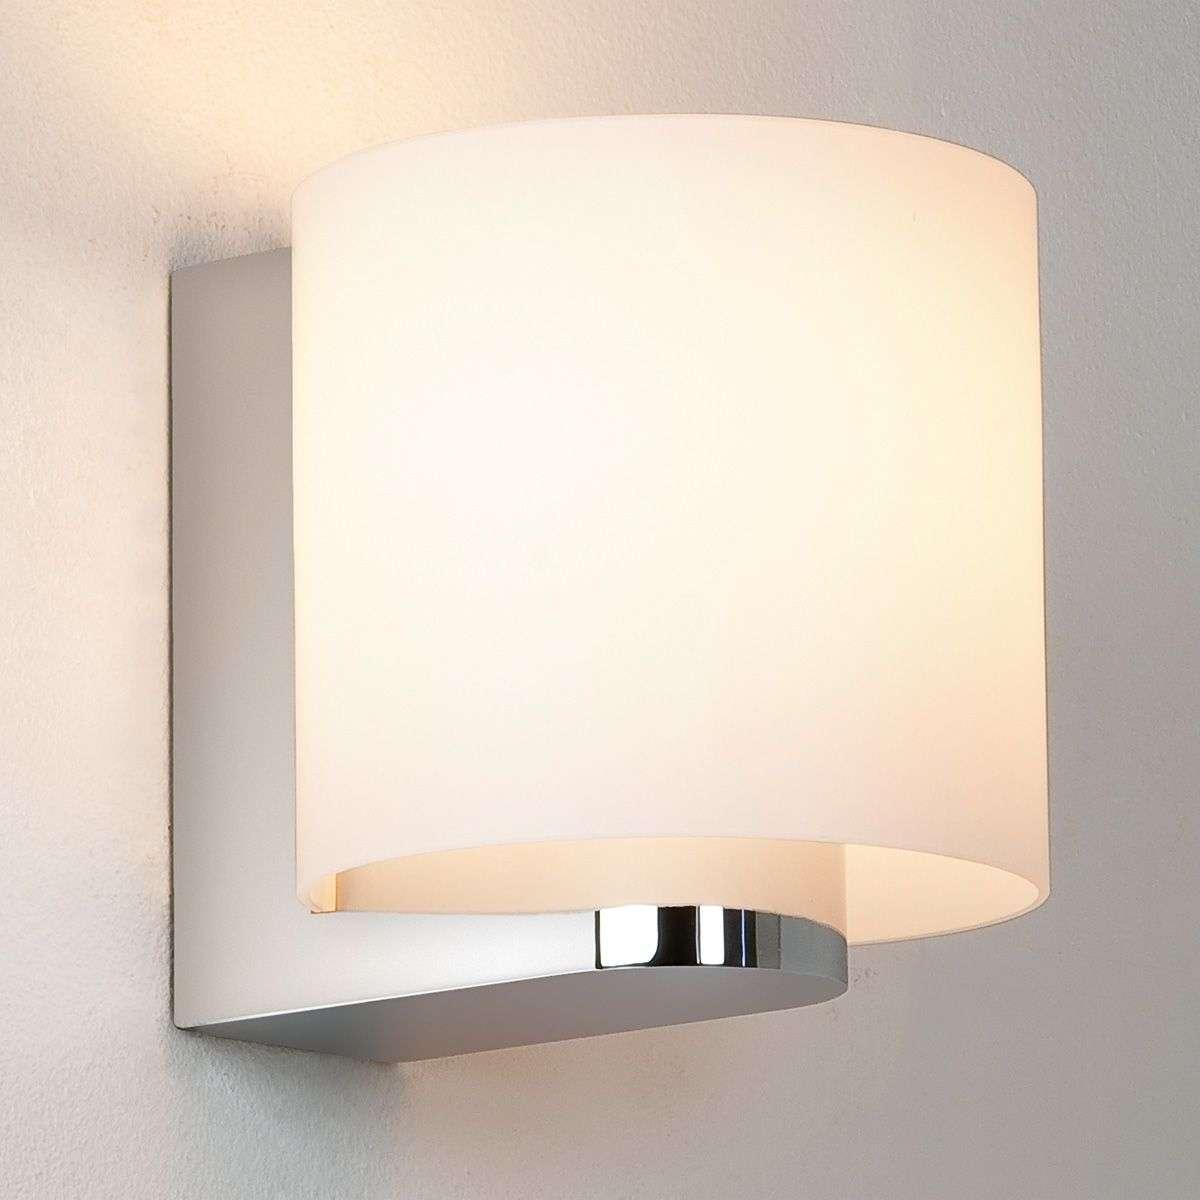 Siena Round Wall Light Timeless-1020005-32